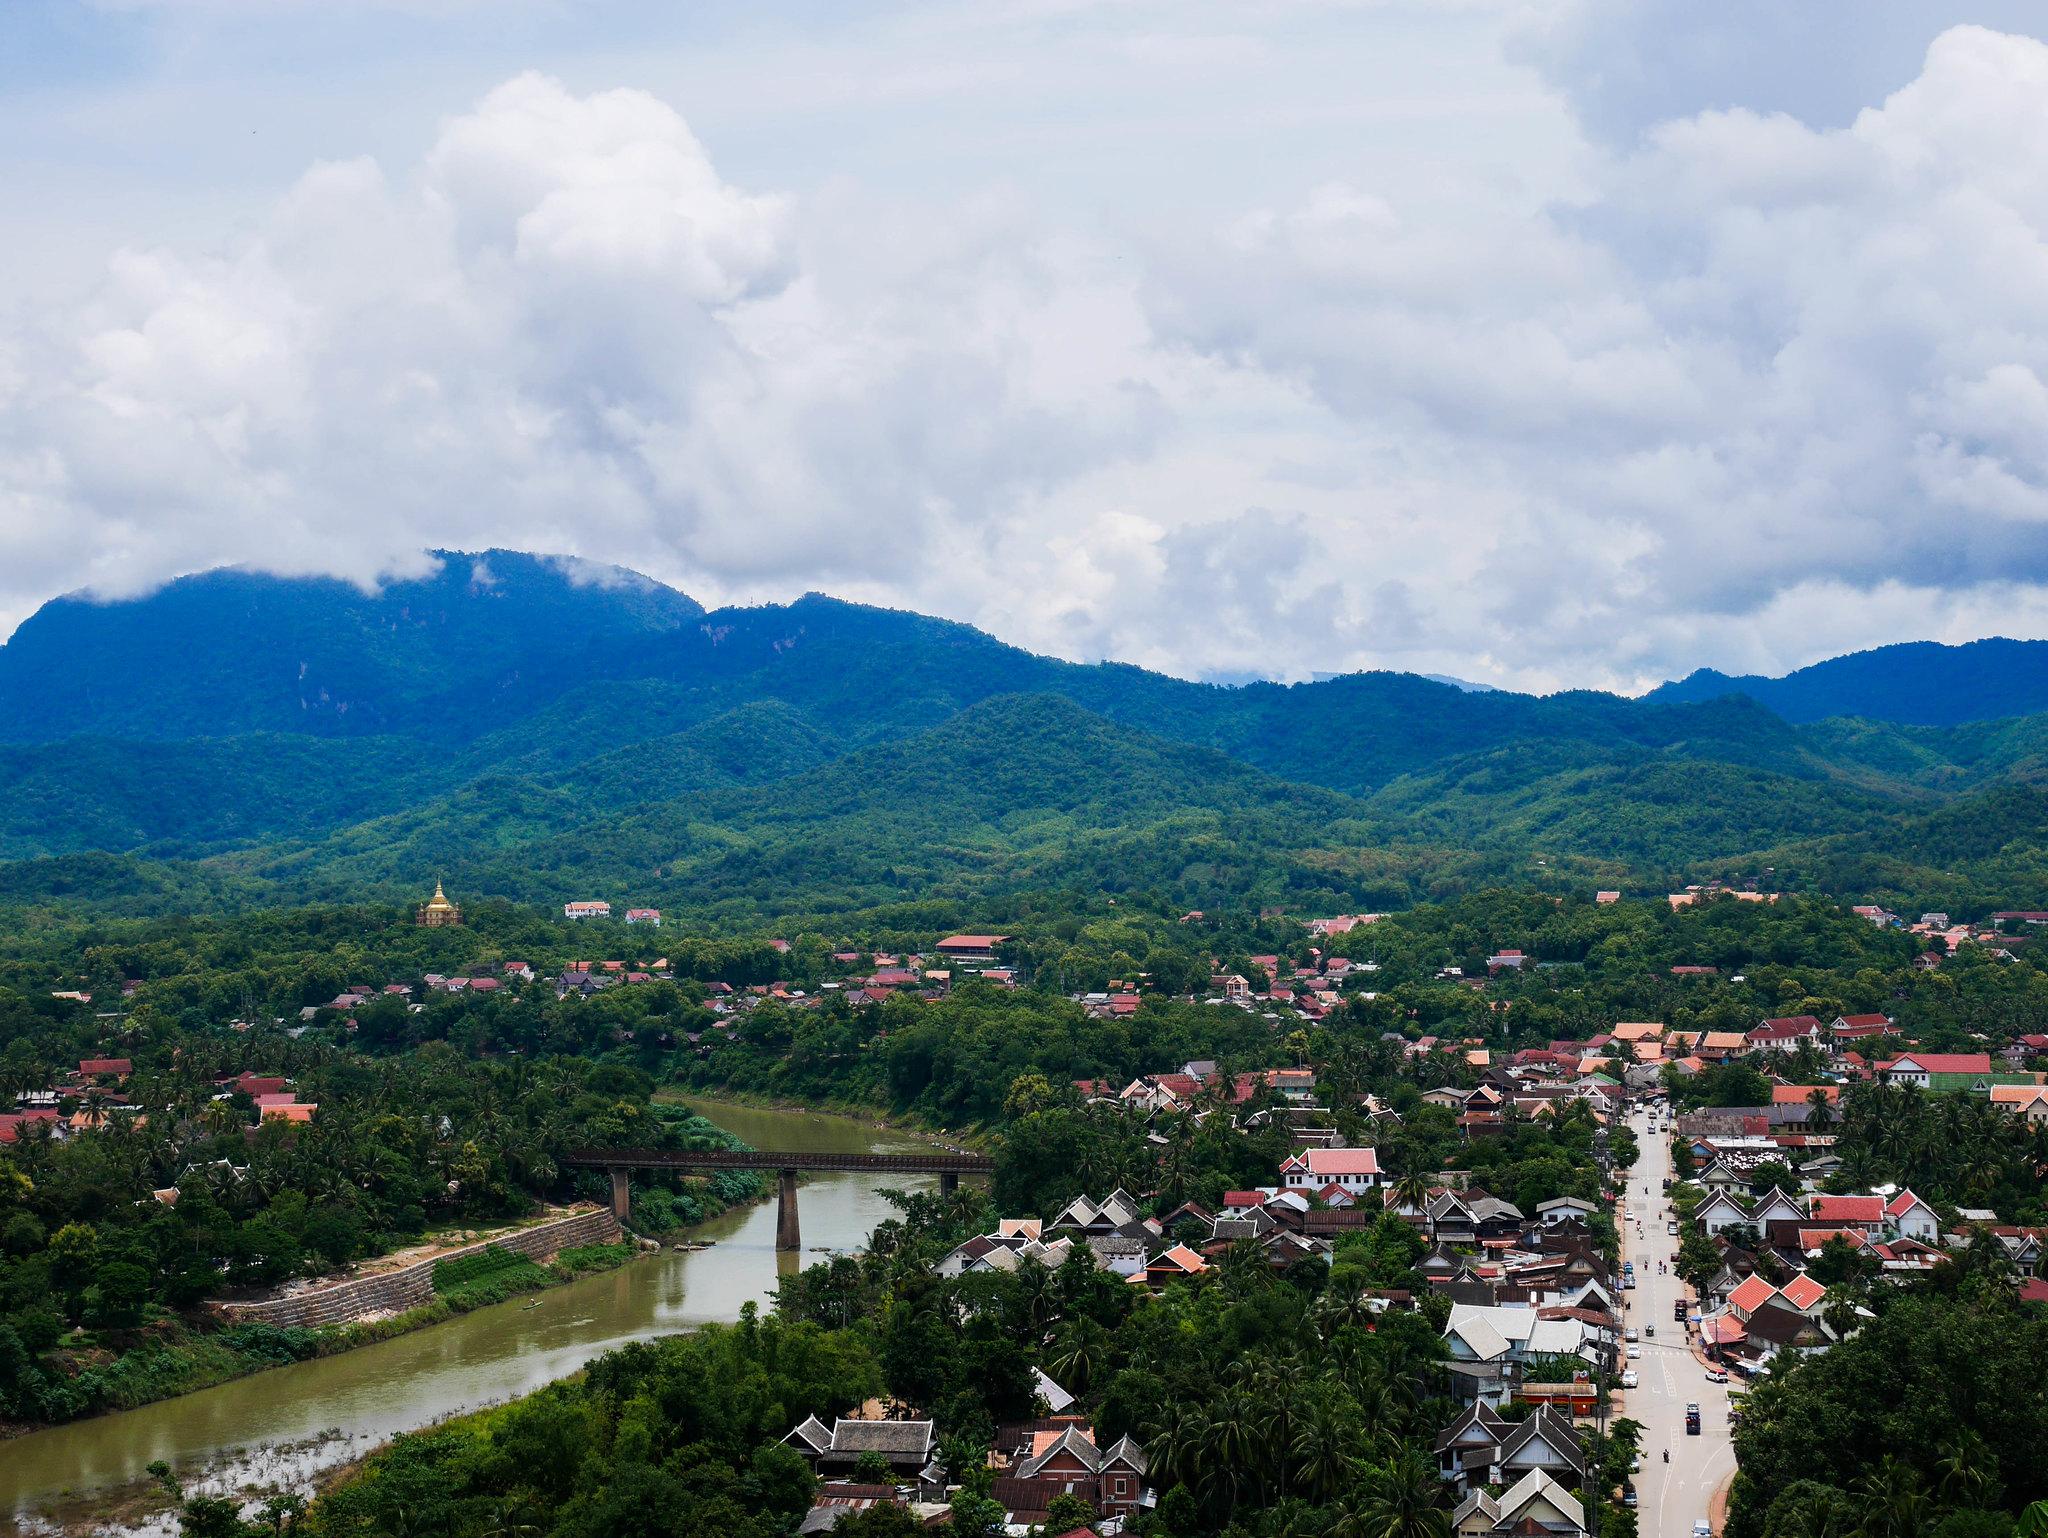 Luang Prabang et les chutes d'eau de Kuang Si